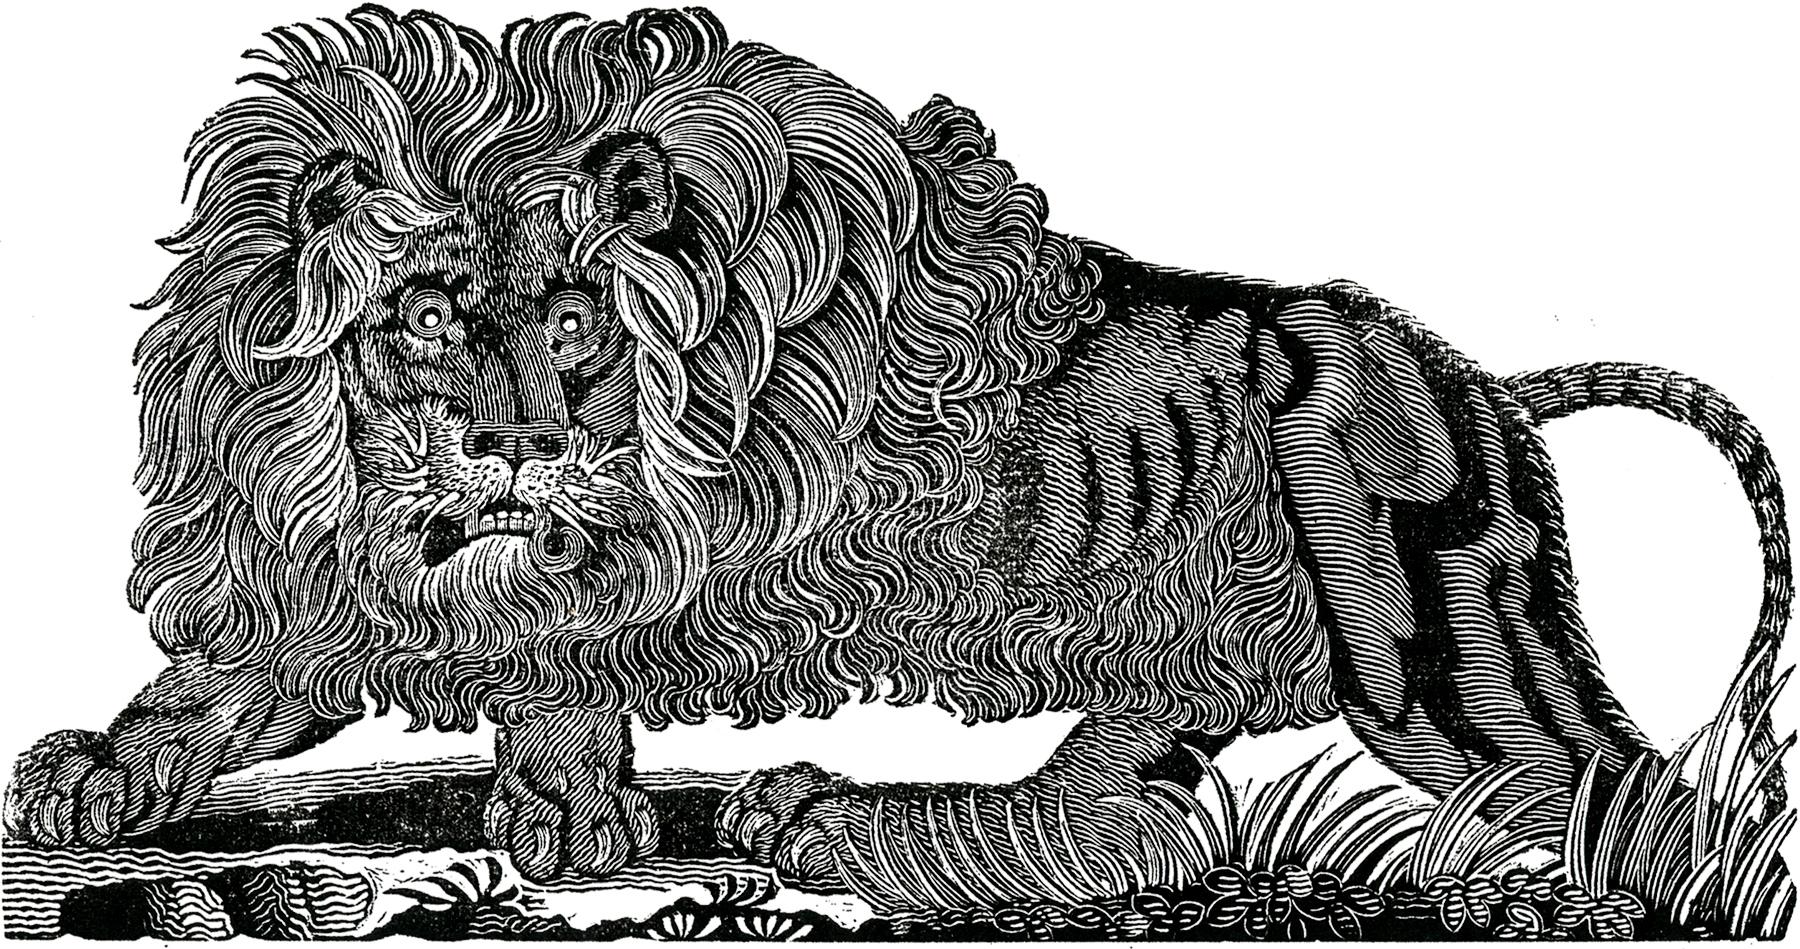 free public domain lion image the graphics fairy